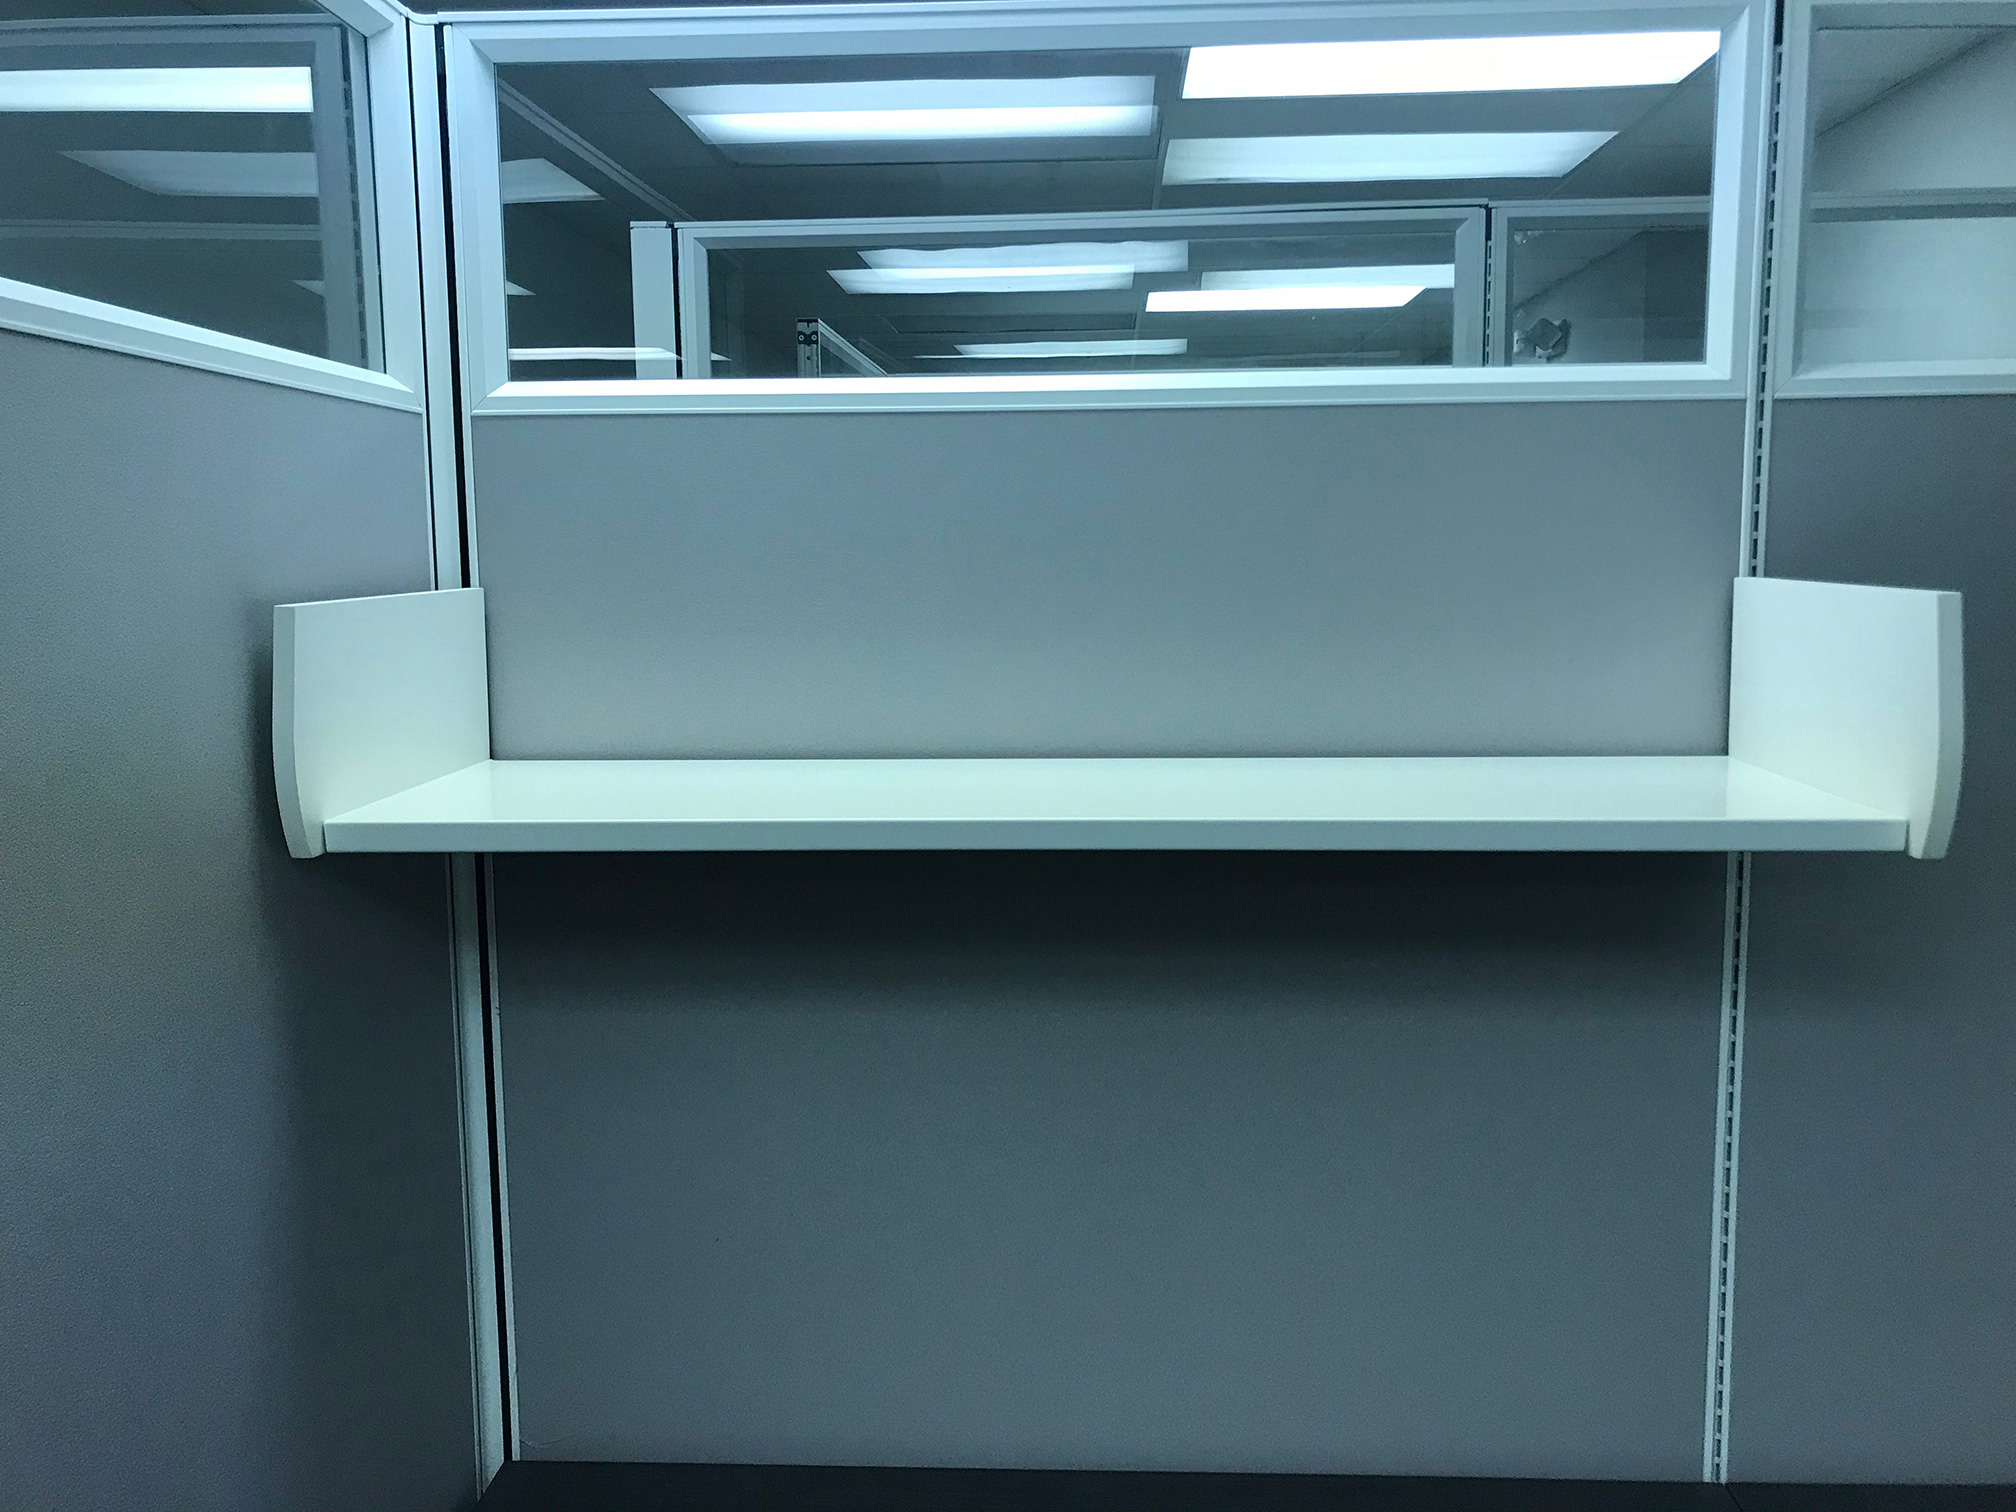 office-cubicles-for-sale-in-daytona-beach-florida-3-1.jpg